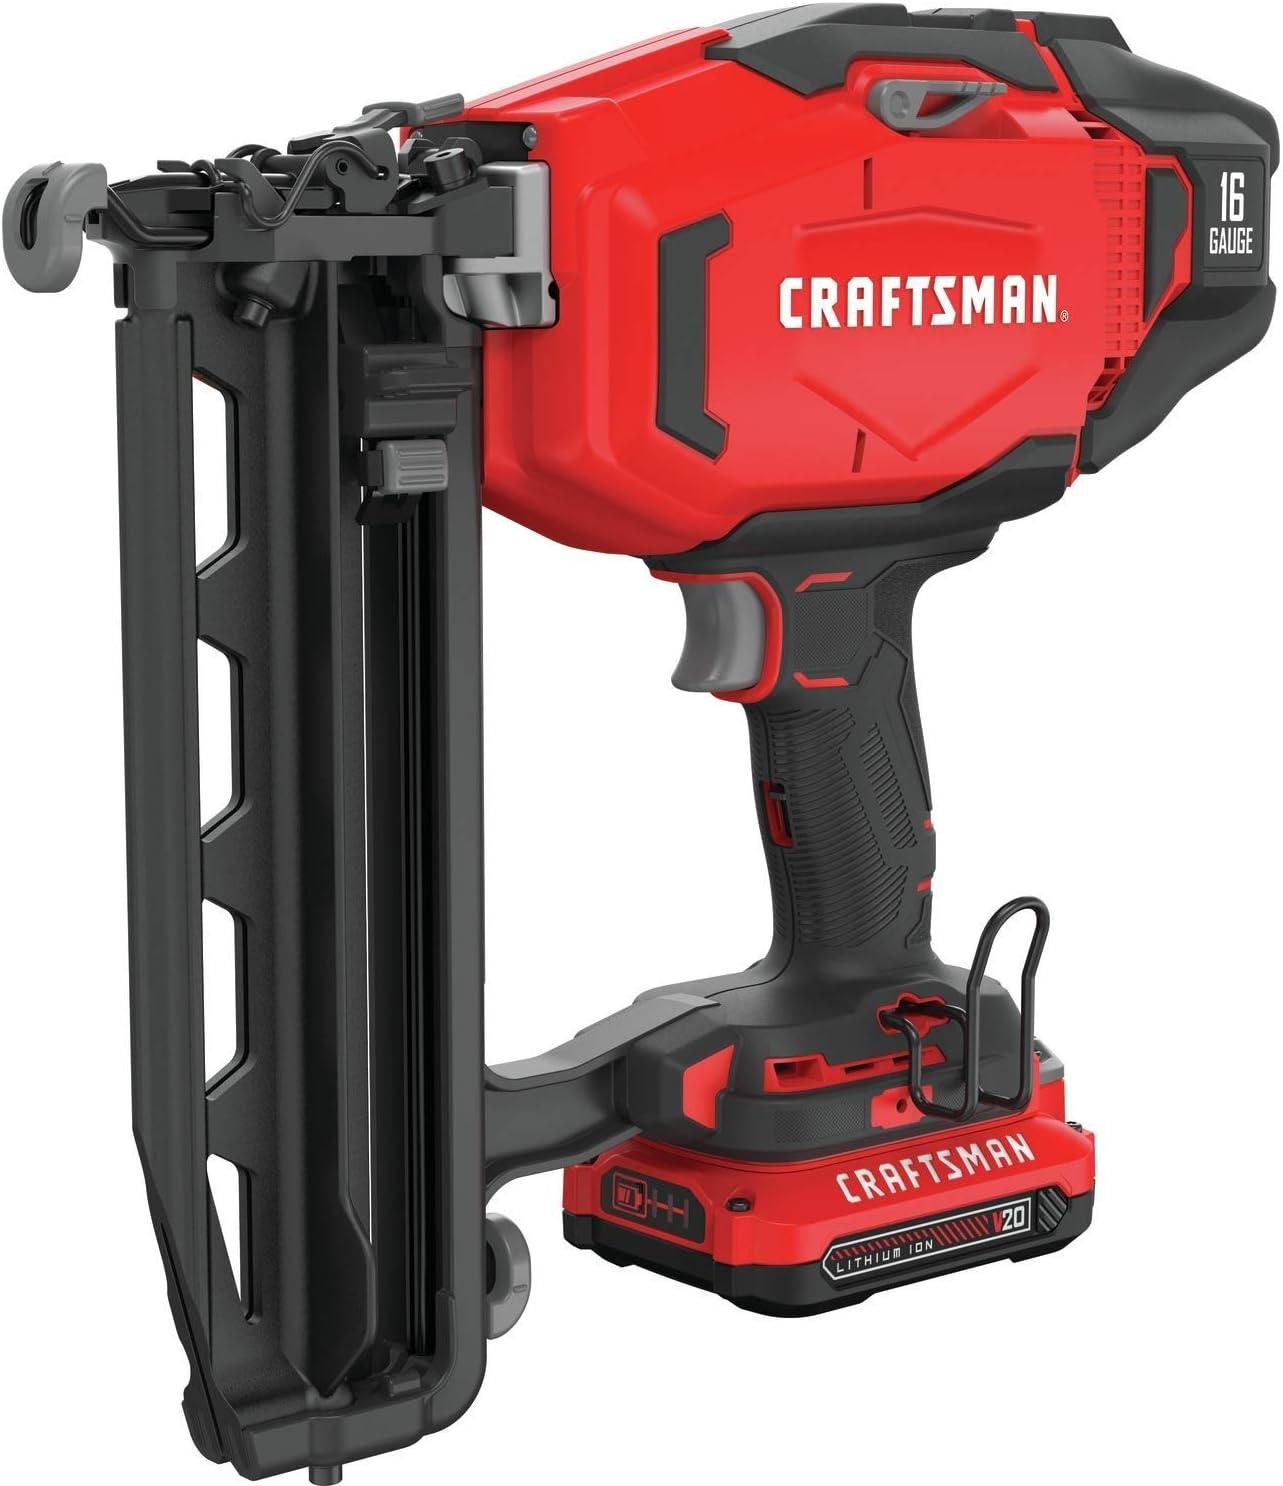 CRAFTSMAN CMCN616C1 Cordless Finish Nailer Kit